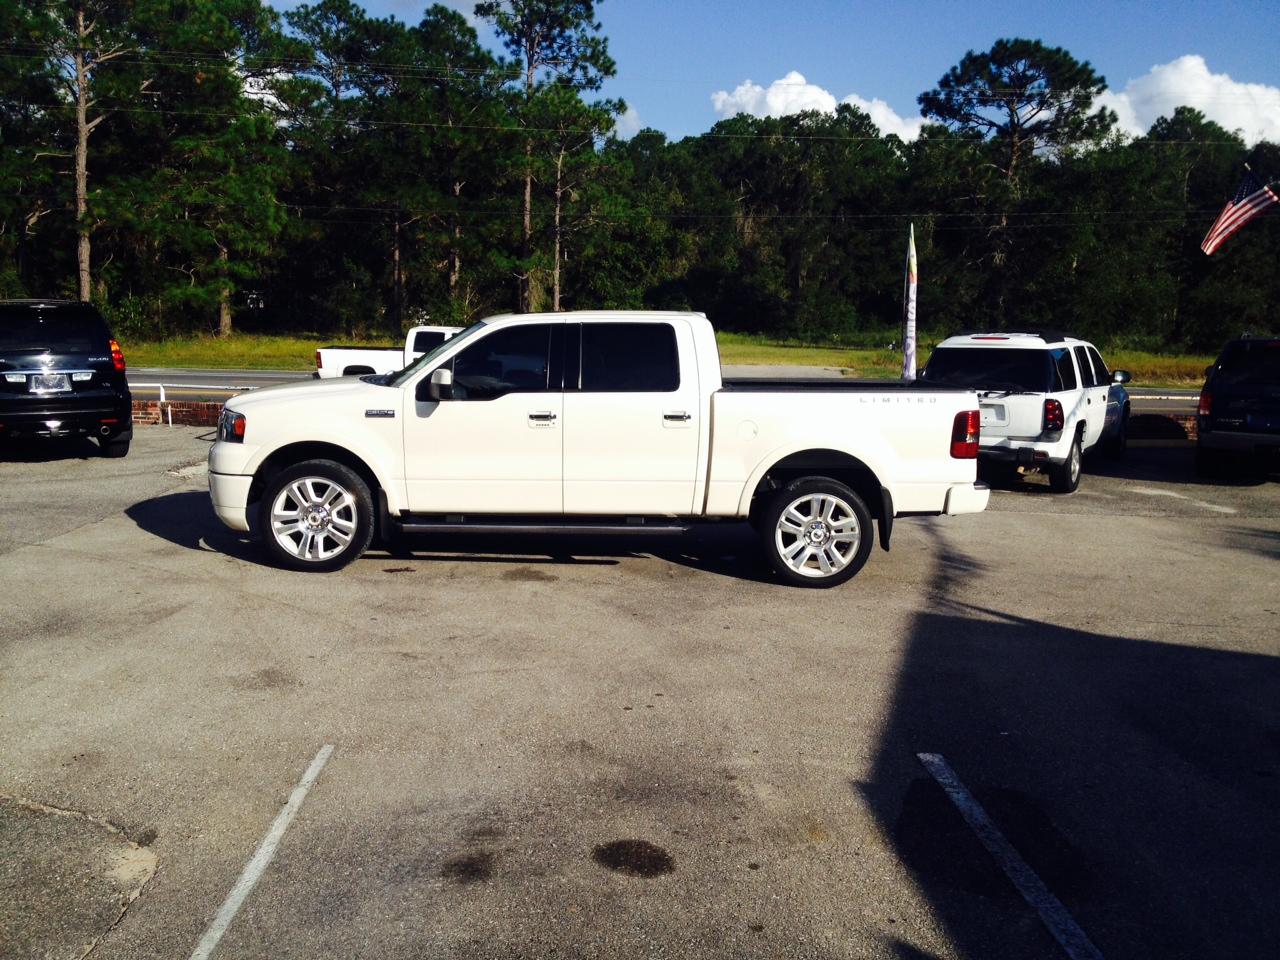 Uprite Auto Sales, Crawfordville FL